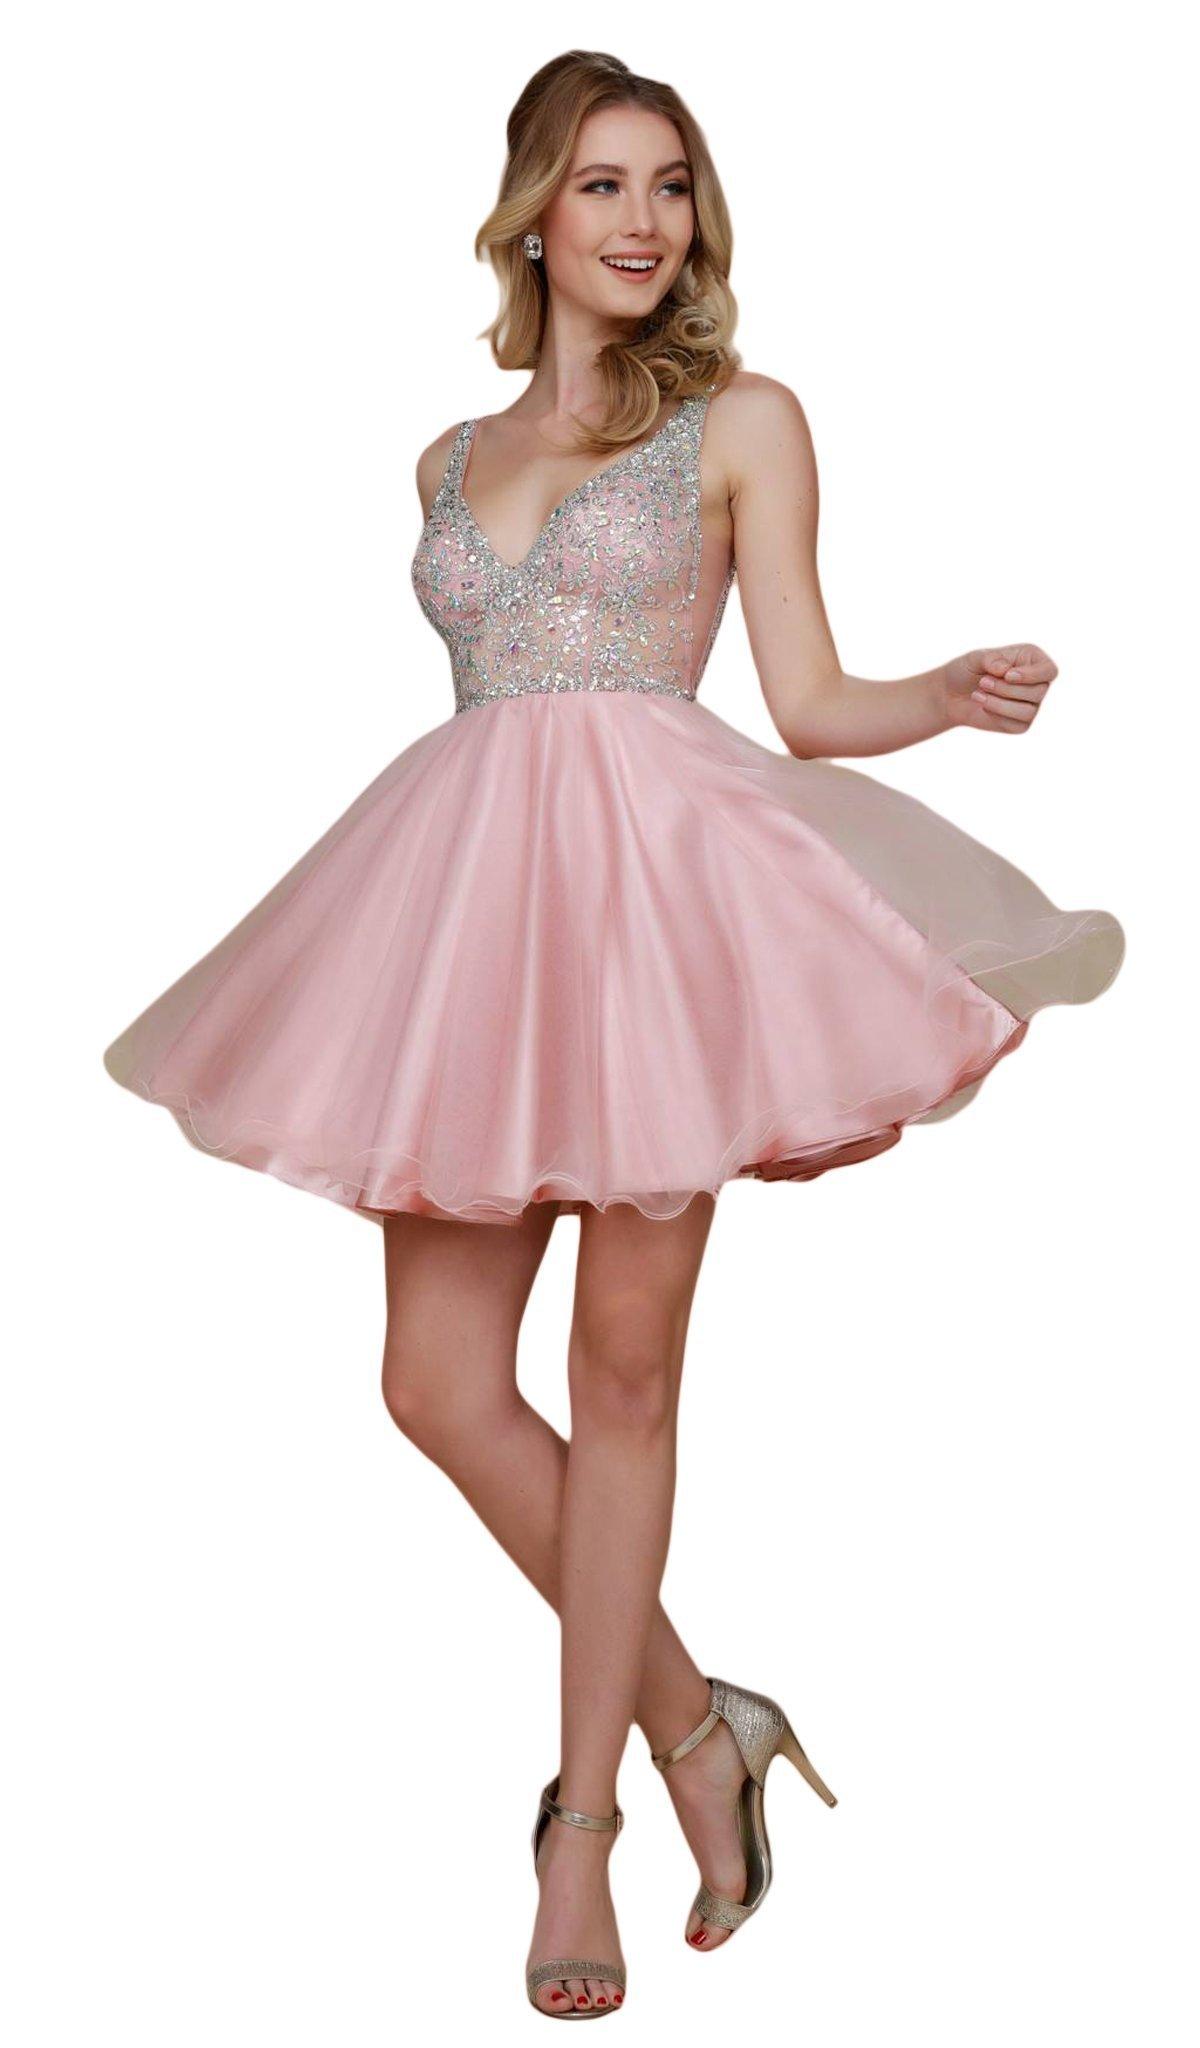 Nox Anabel - G637 Bejeweled Plunging V-neck Ruffled A-line Dress